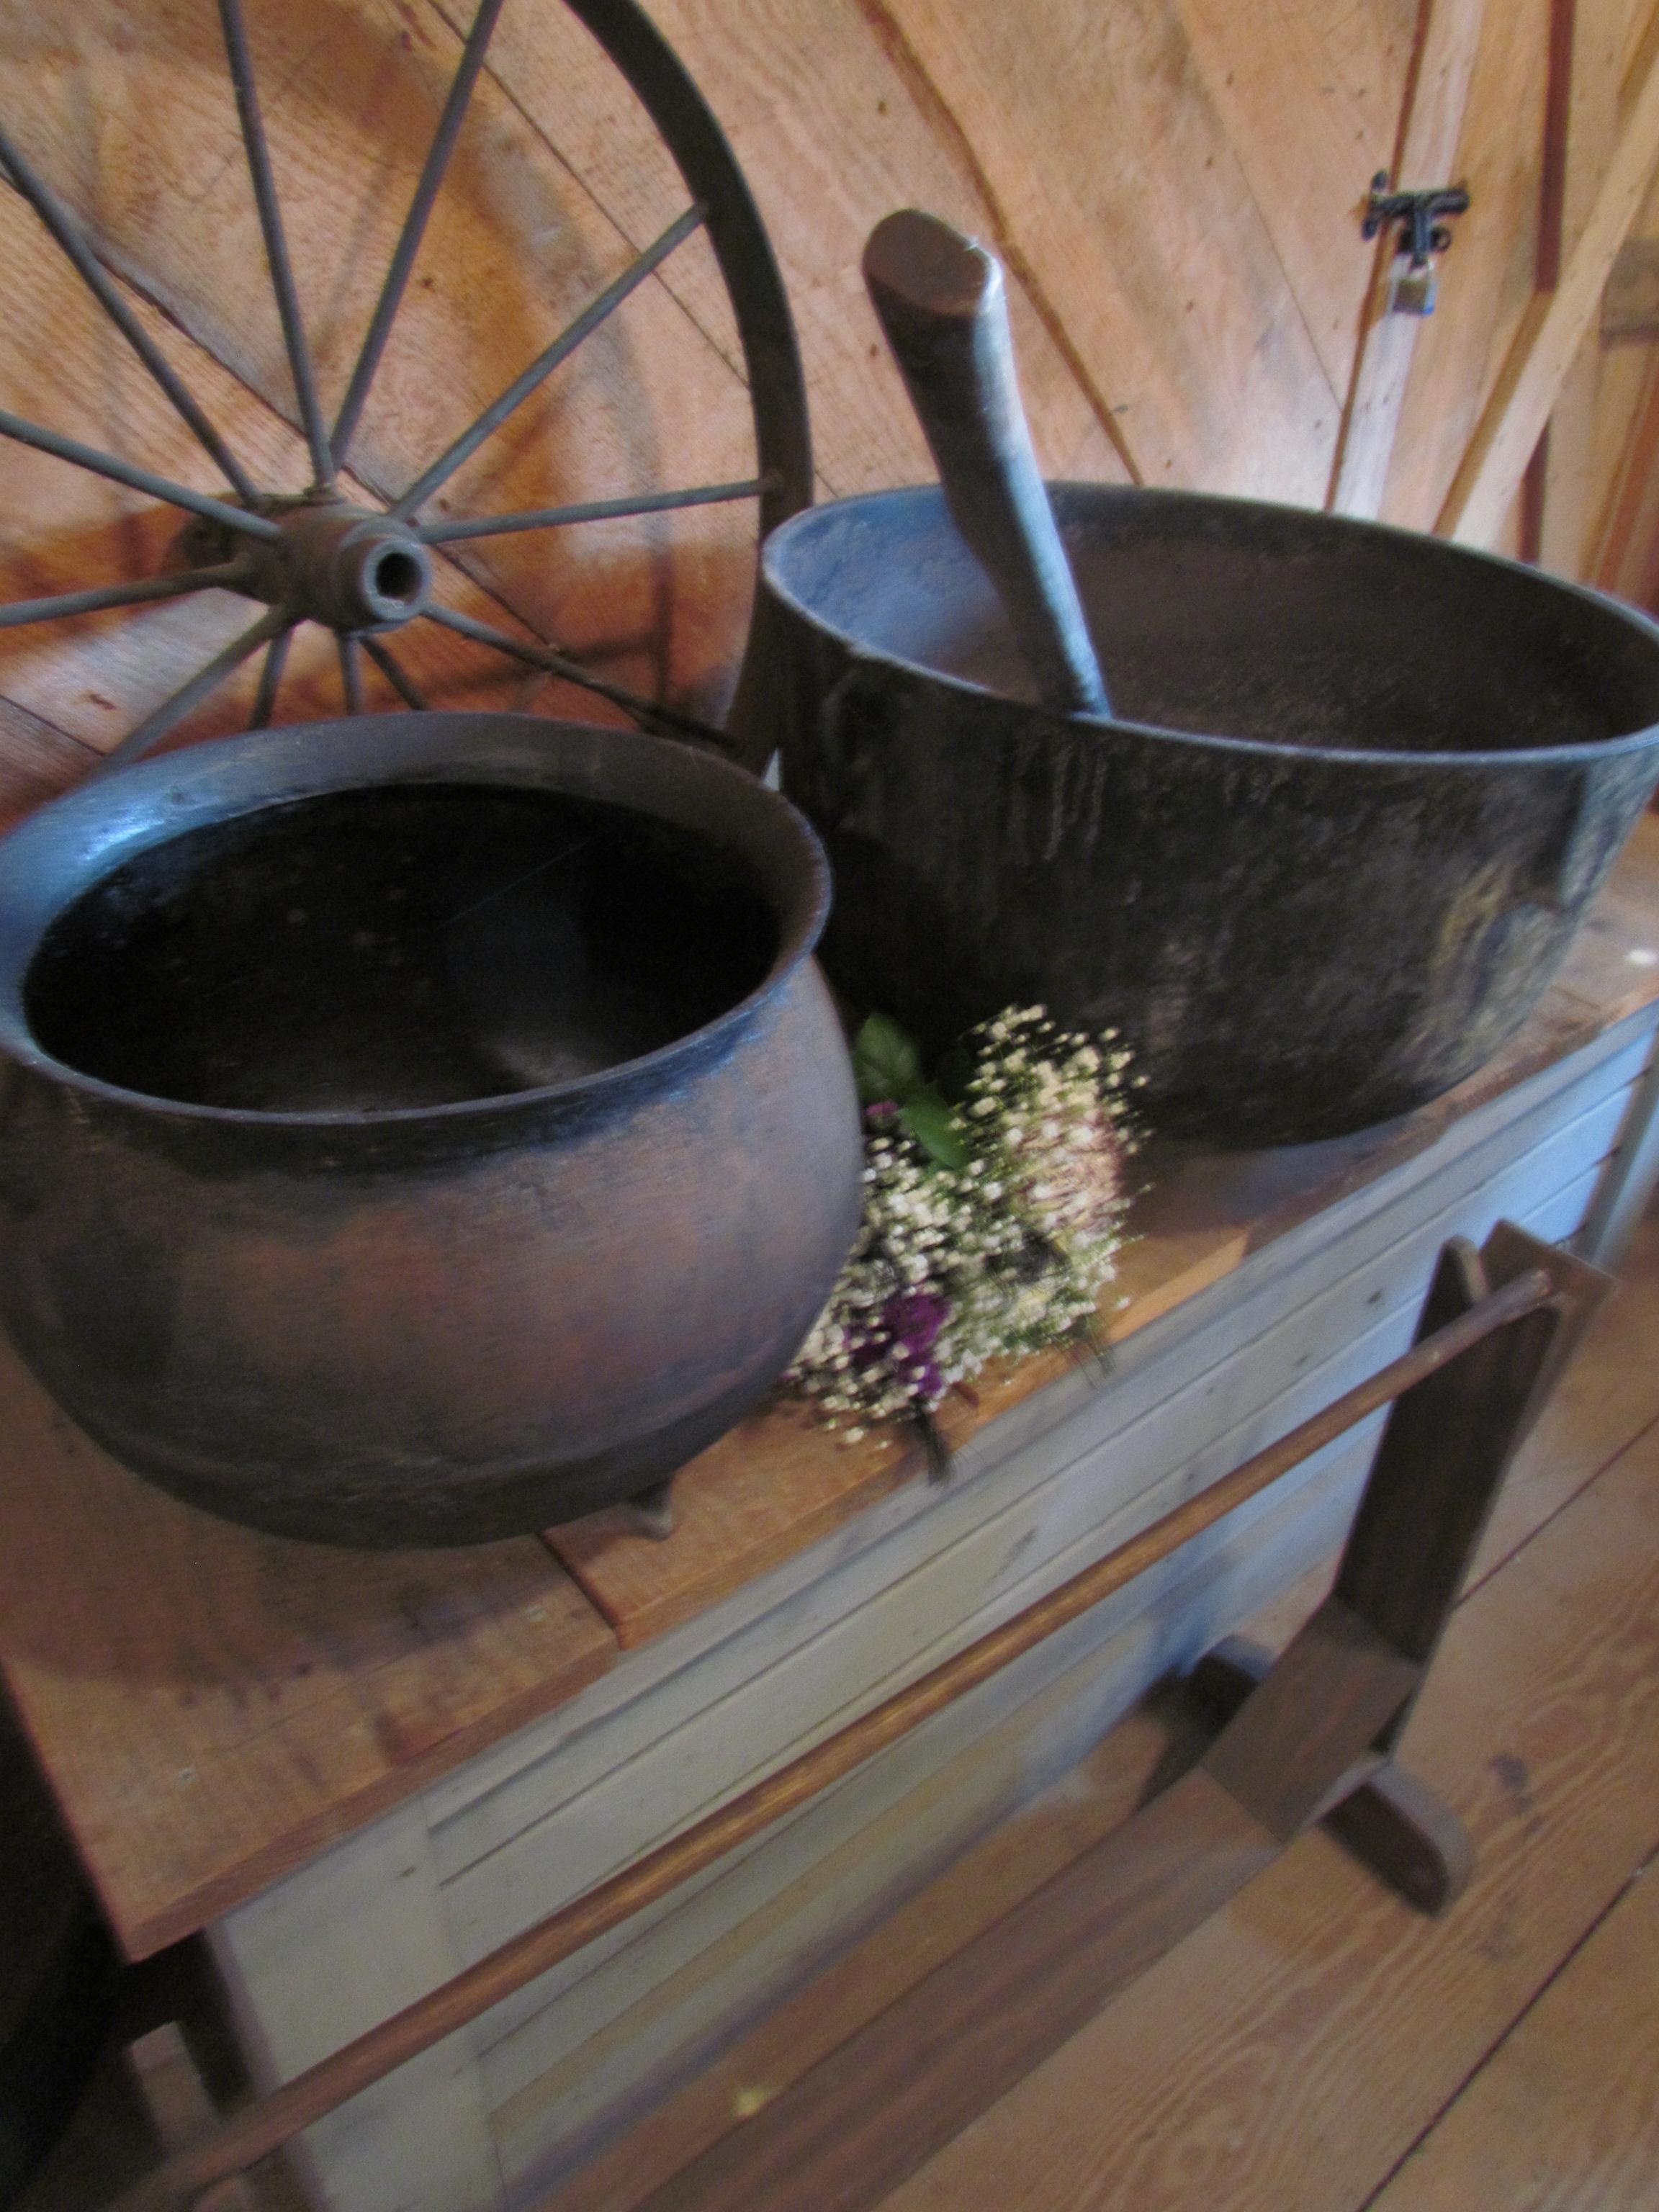 Iron pot, wheel, flowers, rustic